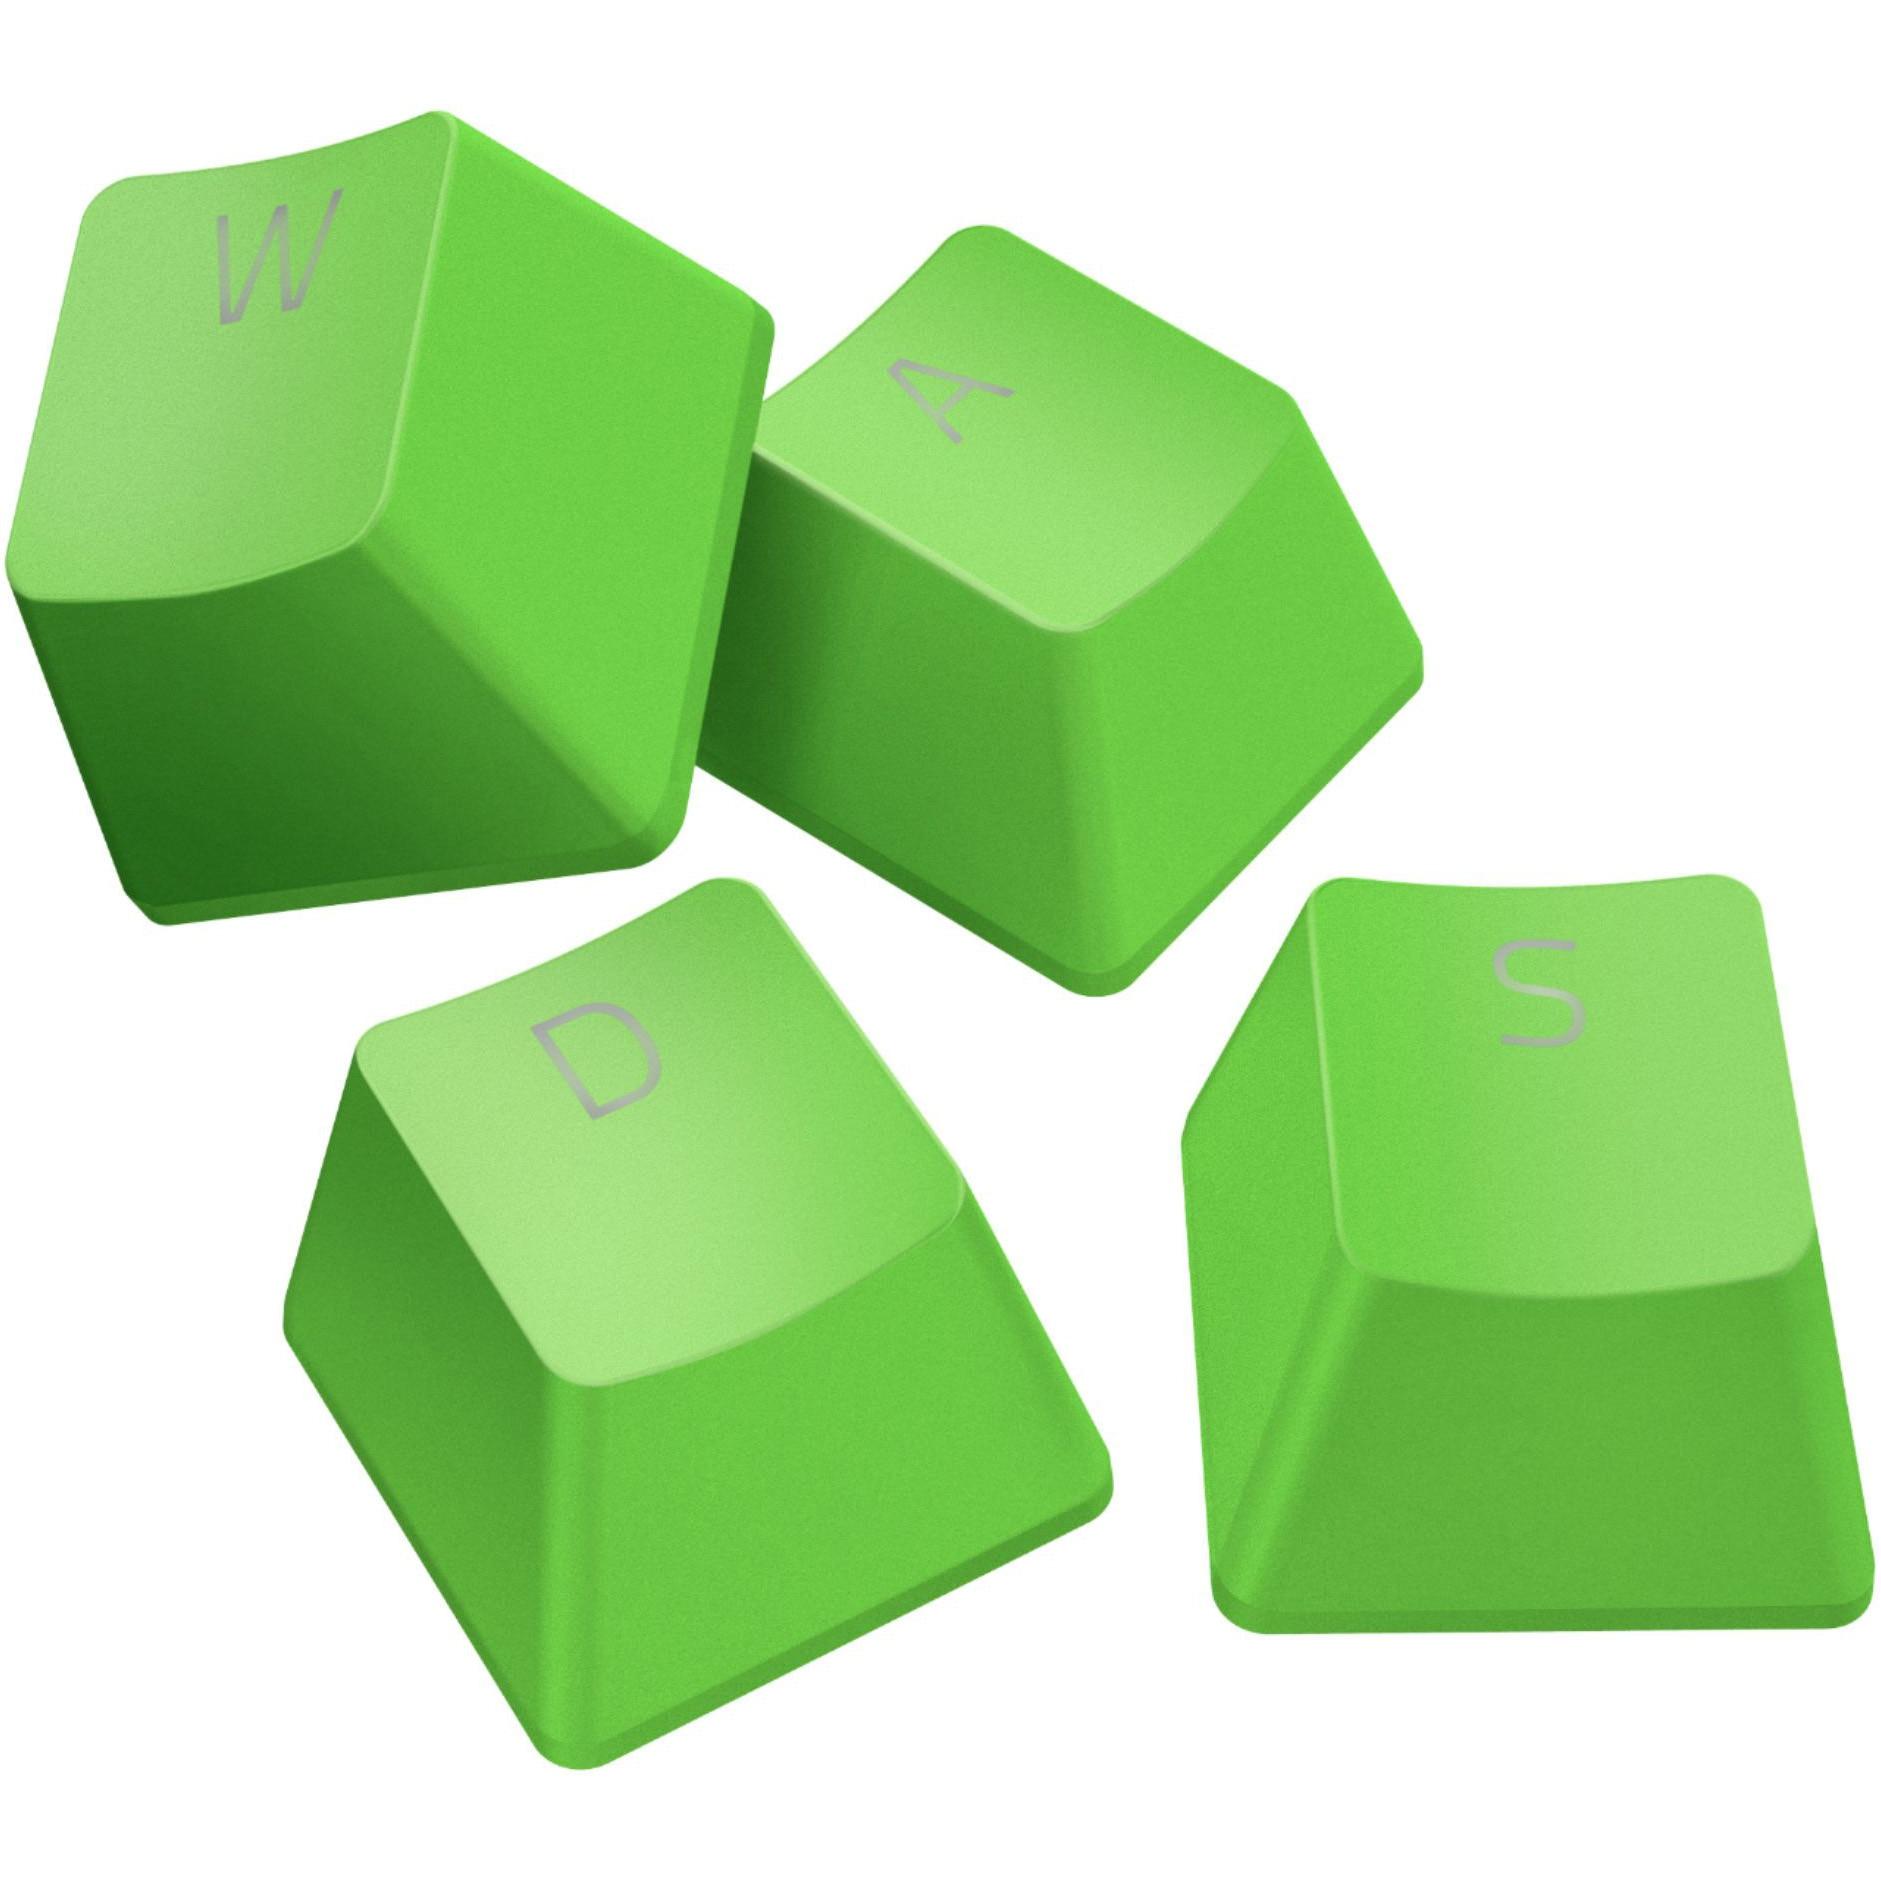 Fotografie Kit butoane tastatura Razer PBT Doubleshot, compatibile switch mecanic si optic Razer - Green